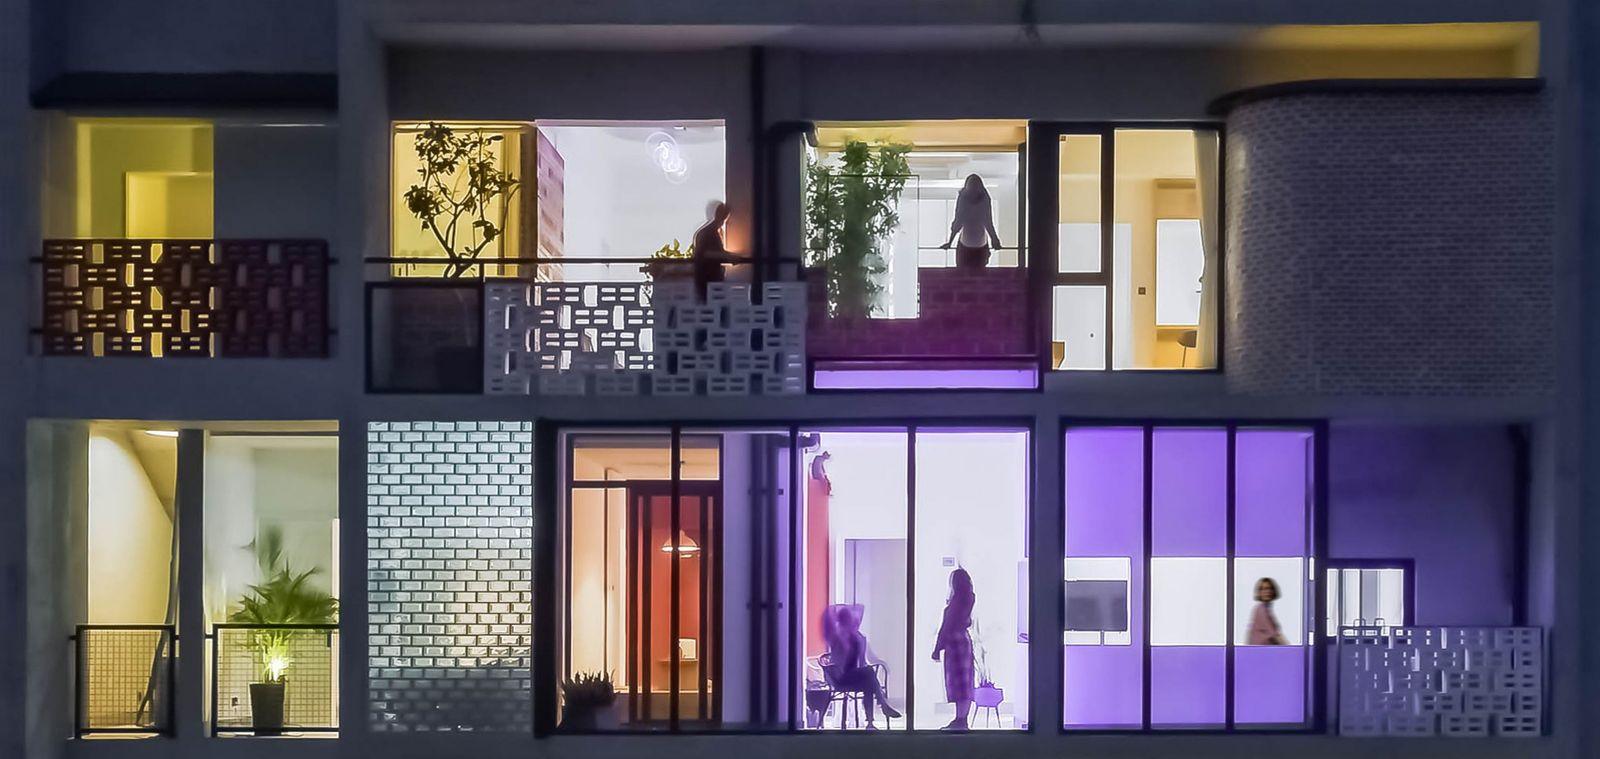 Dezeen Awards 2020 The Borderless Community of Zi Ni Twelve Portals by Fei Architects